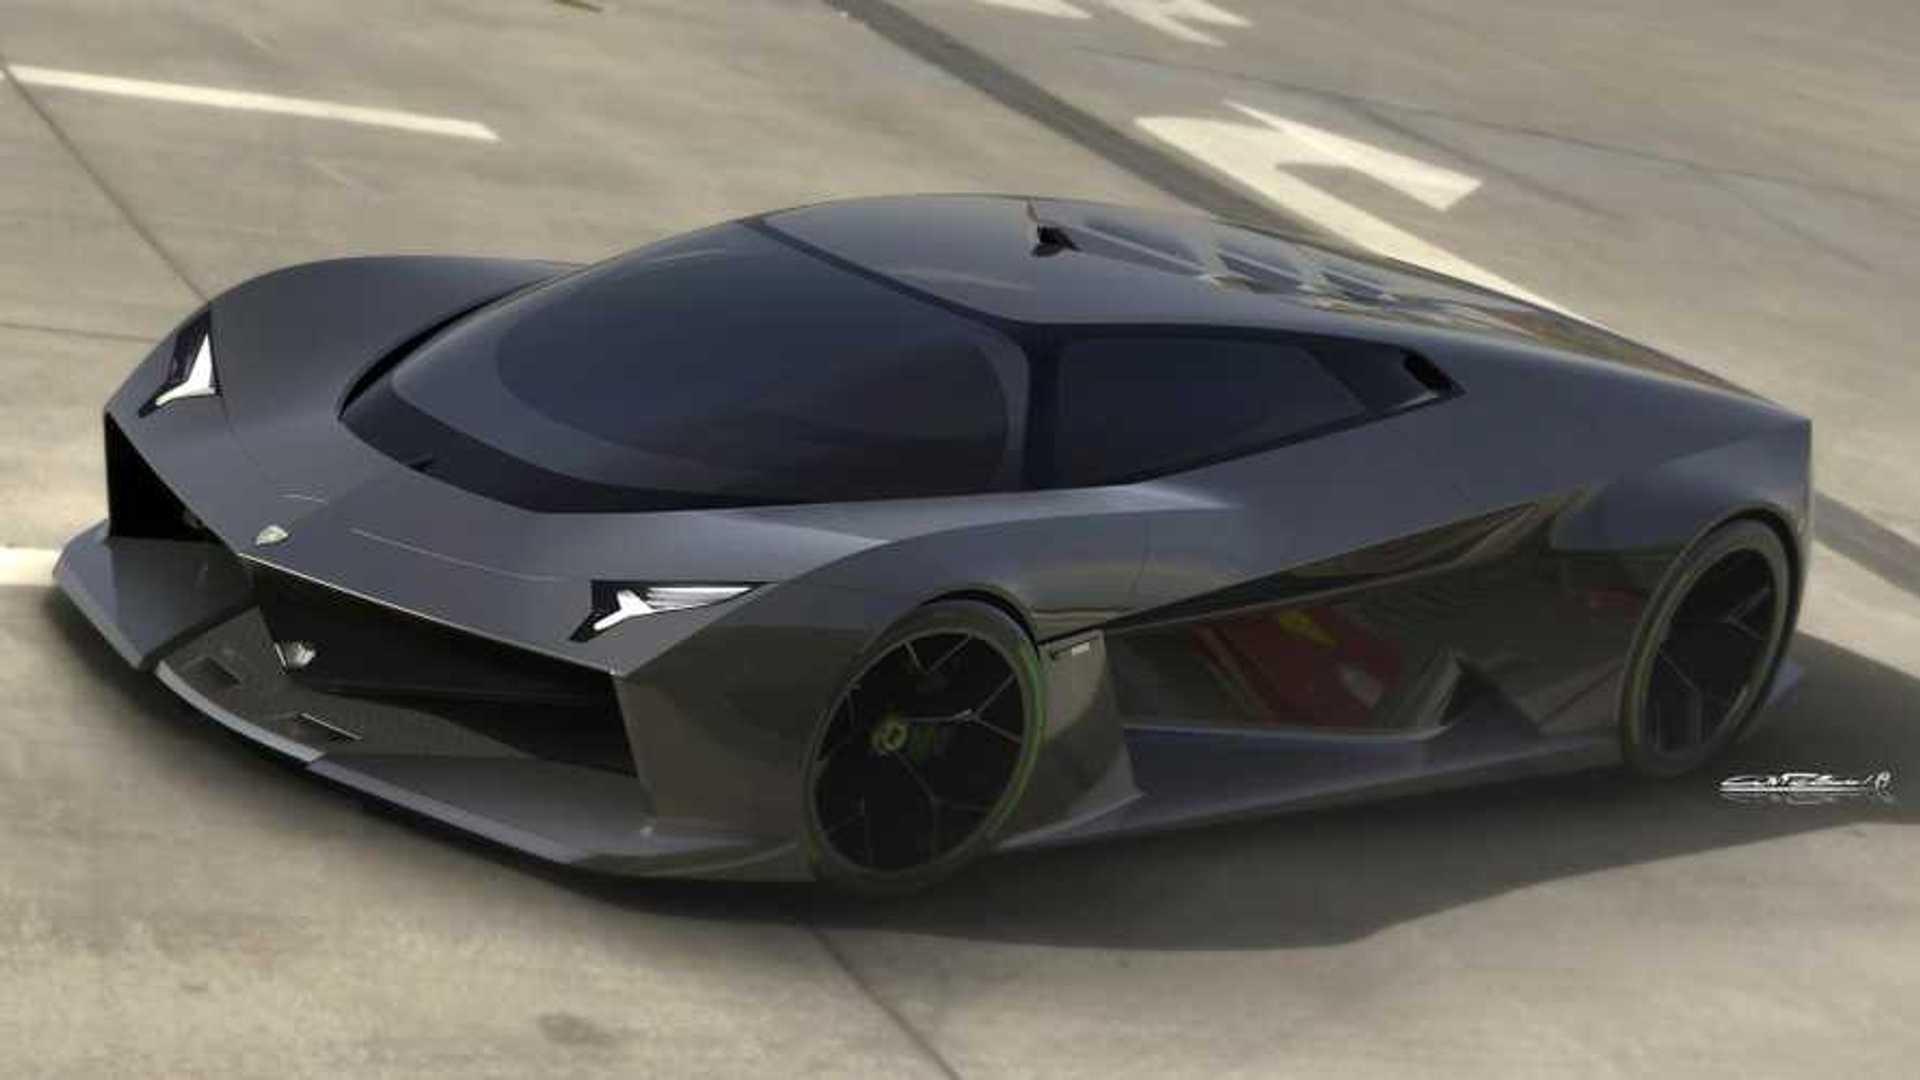 Rendering Of Future Lamborghini Concept Looks Bullishly Good